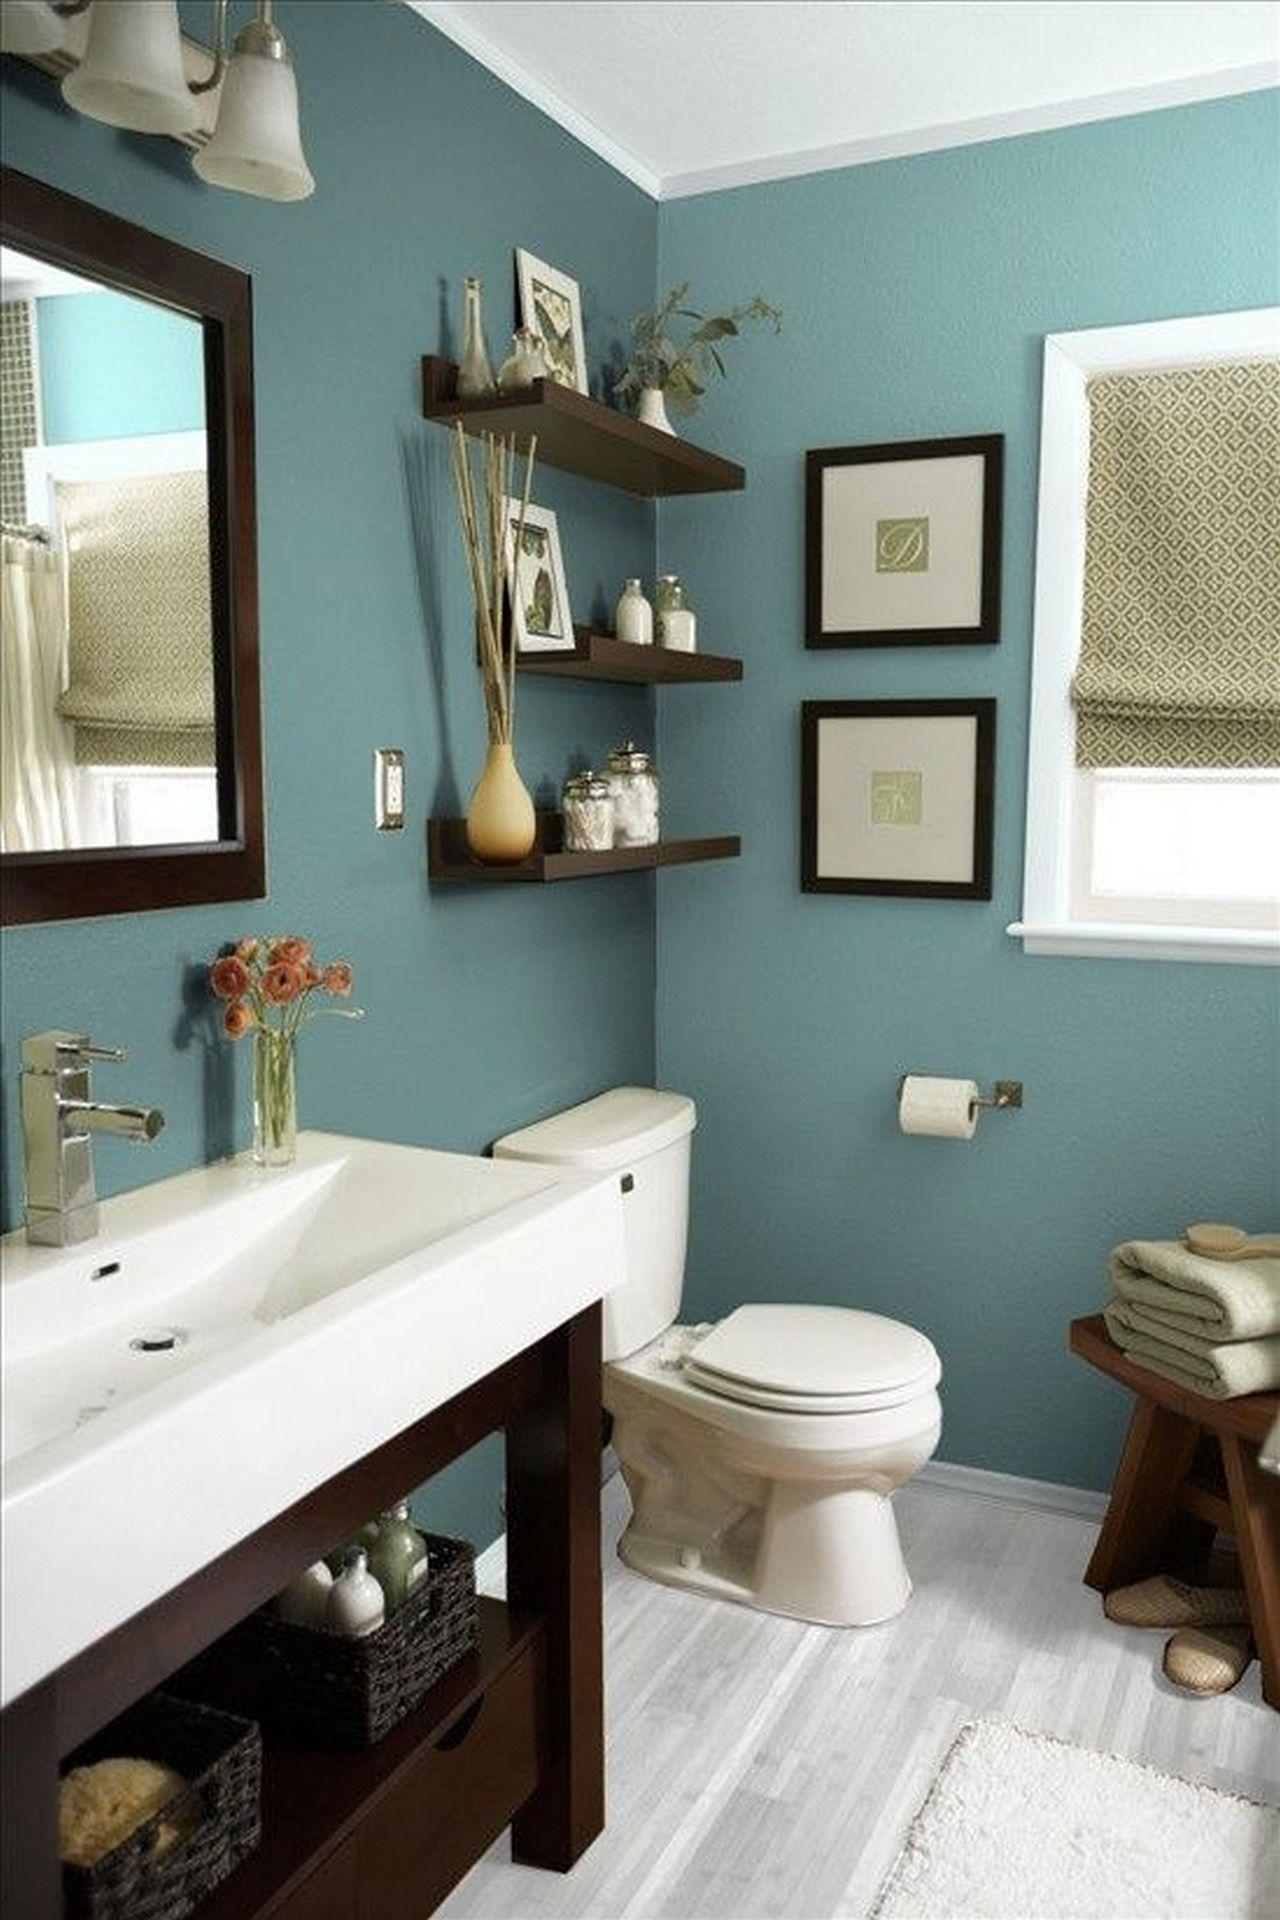 12 Unique Bathroom Decorating Ideas Images Ij05g4 Best Bathroom Paint Colors Small Bathroom Remodel Bathroom Paint Colors